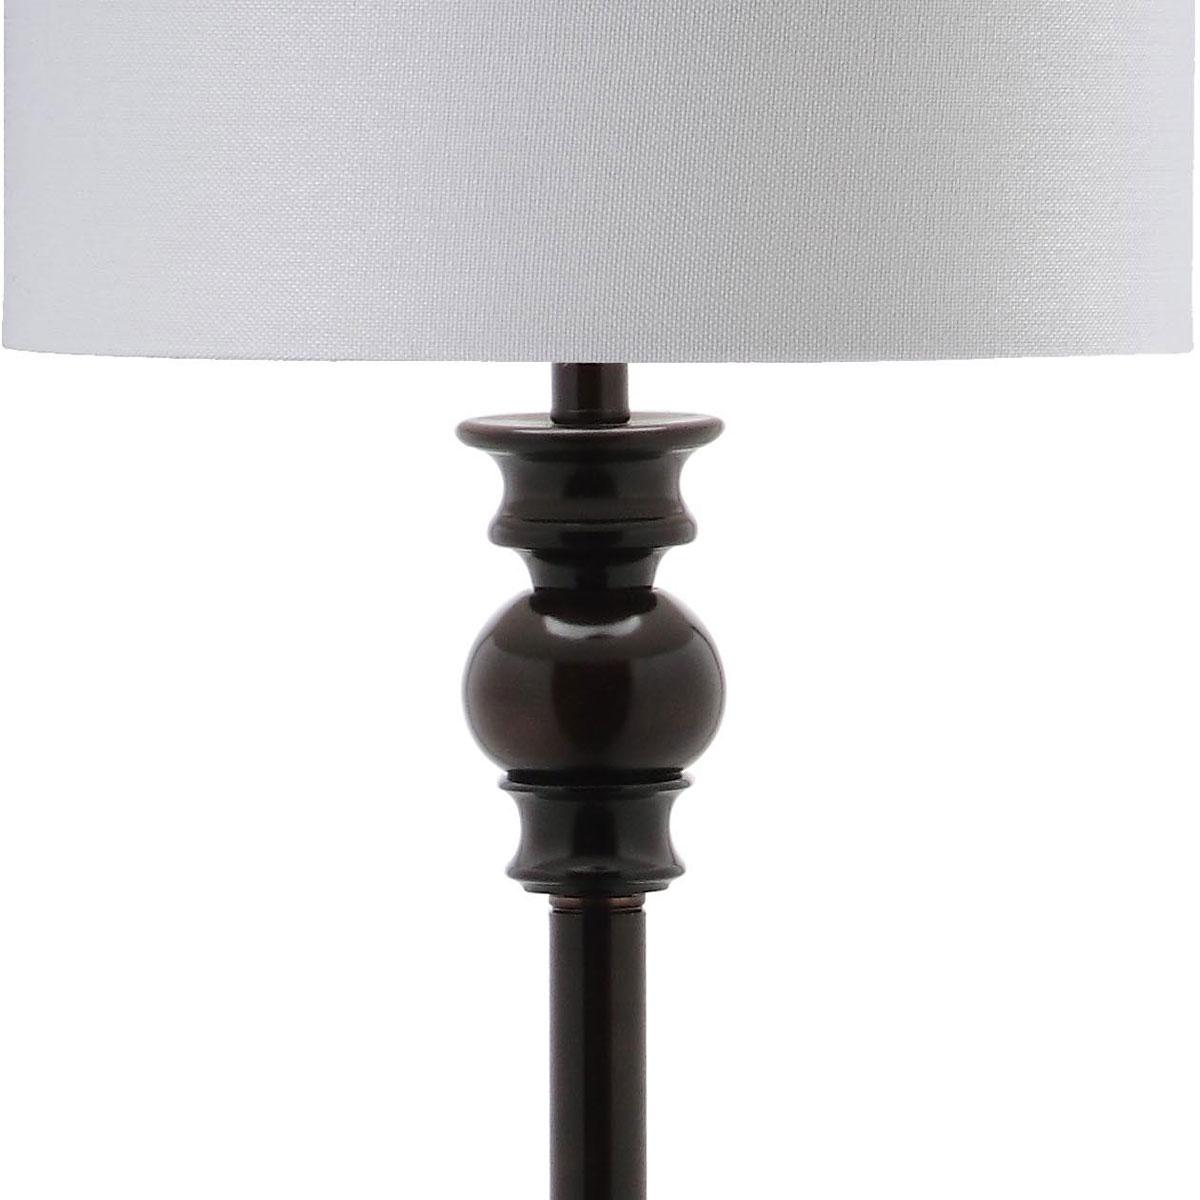 Lit4344a Floor Lamps Lighting By Safavieh